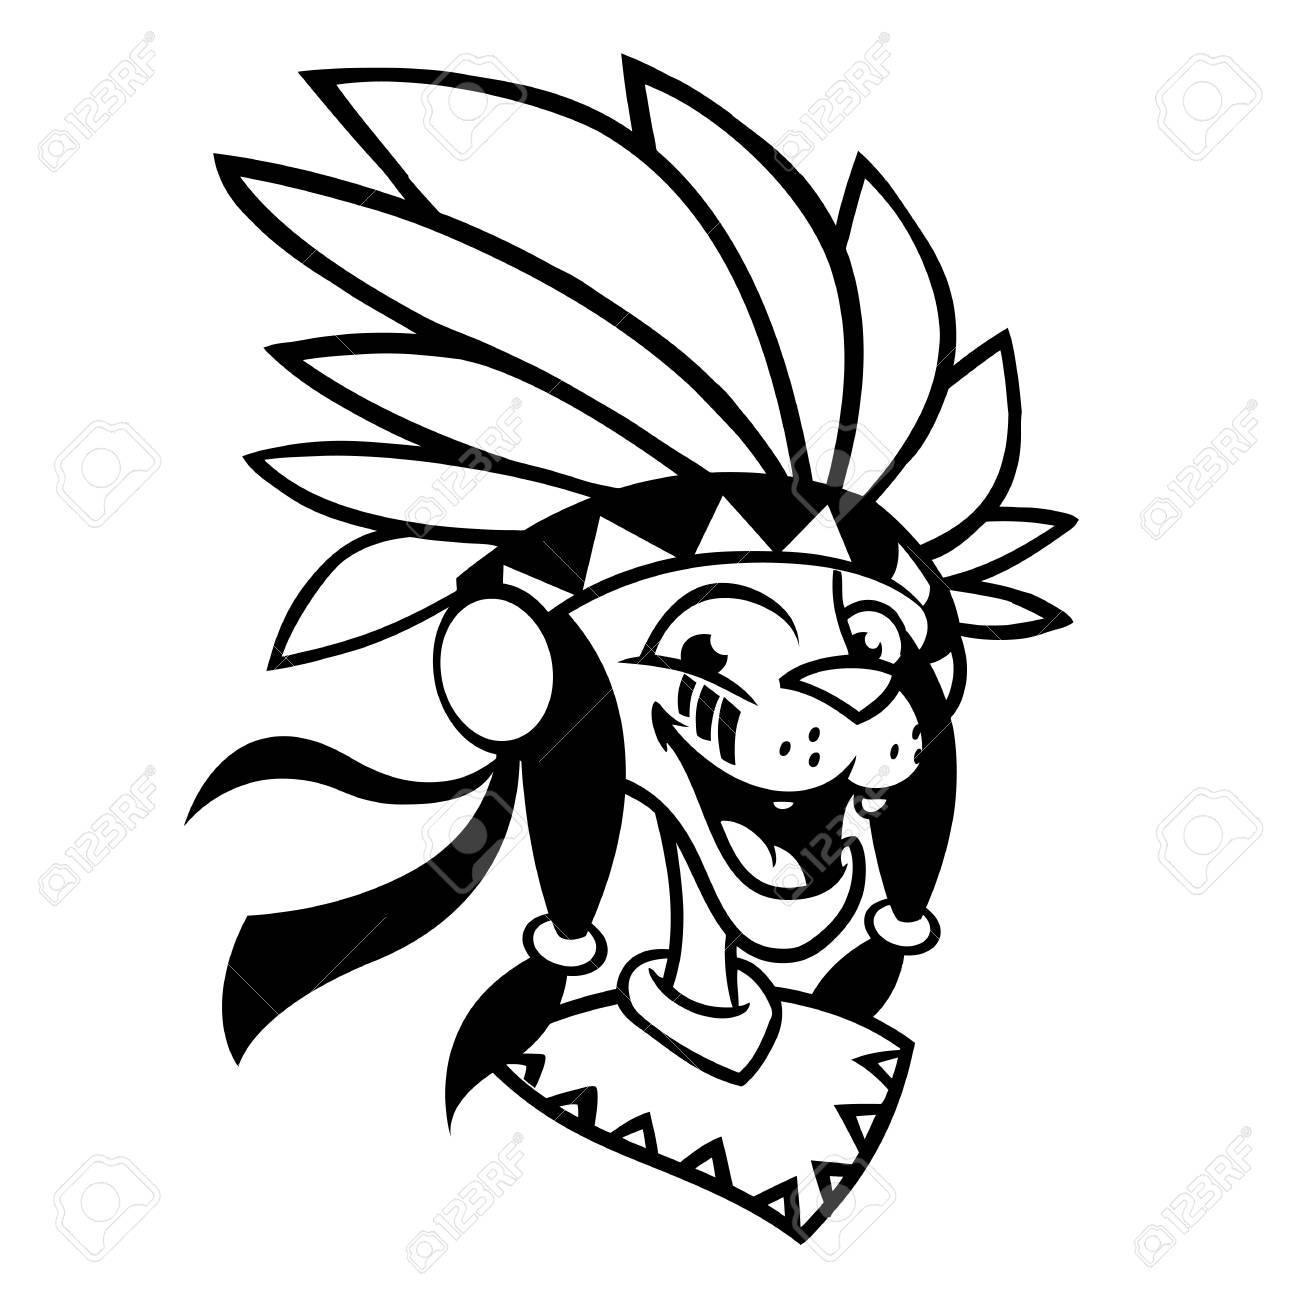 Cartoon Native American Character Coloring Book Vector Illustration